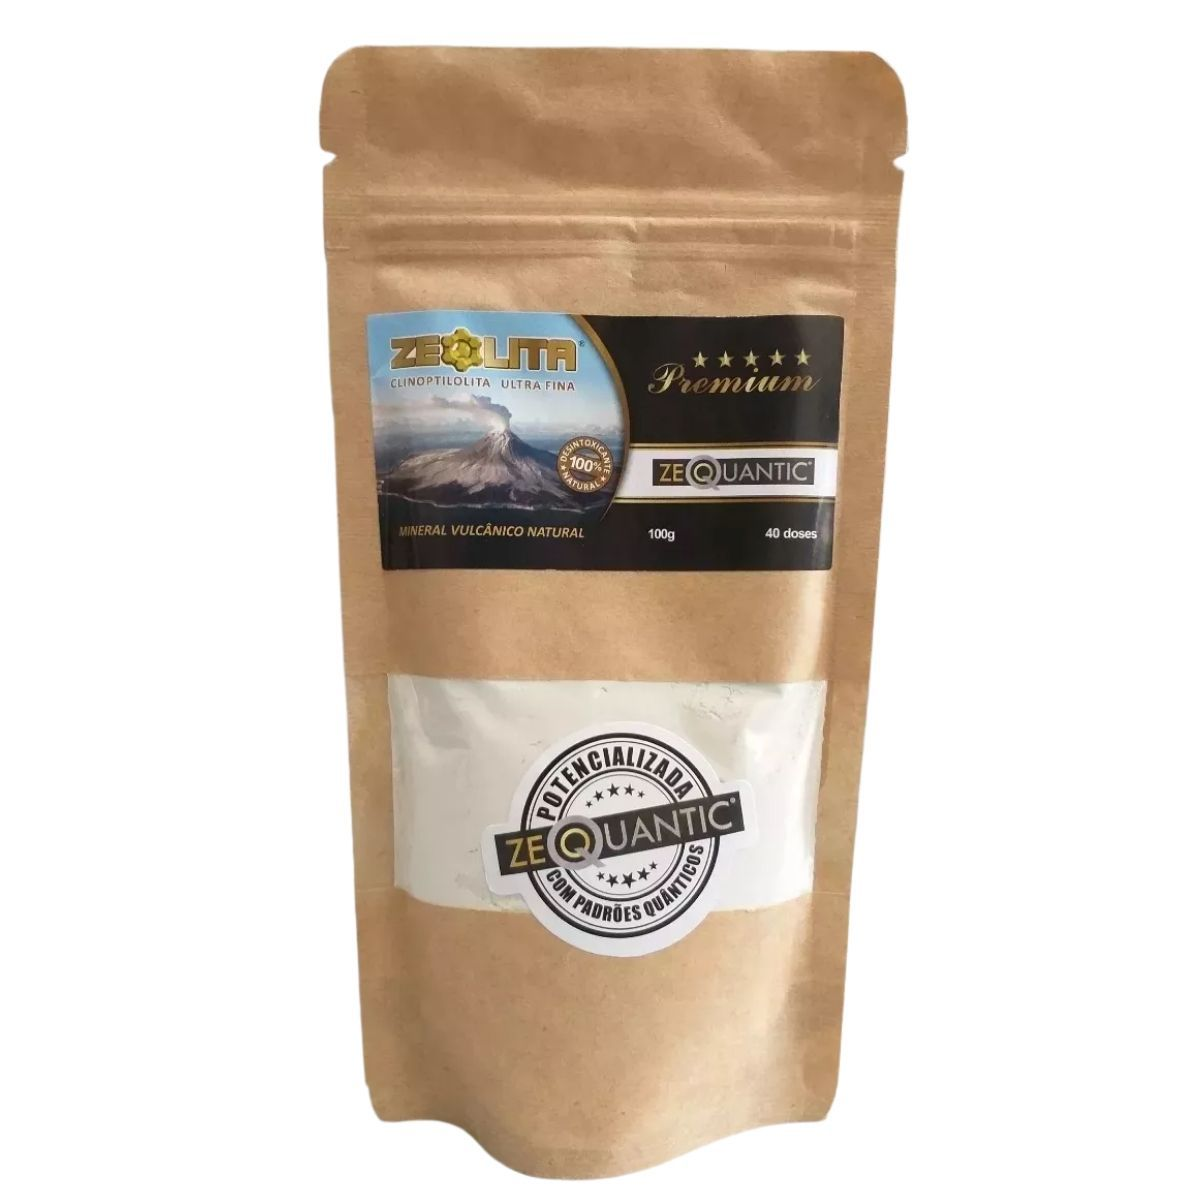 Zeólita Clinoptilolita Premium 100g Potencializada Zeoquantic